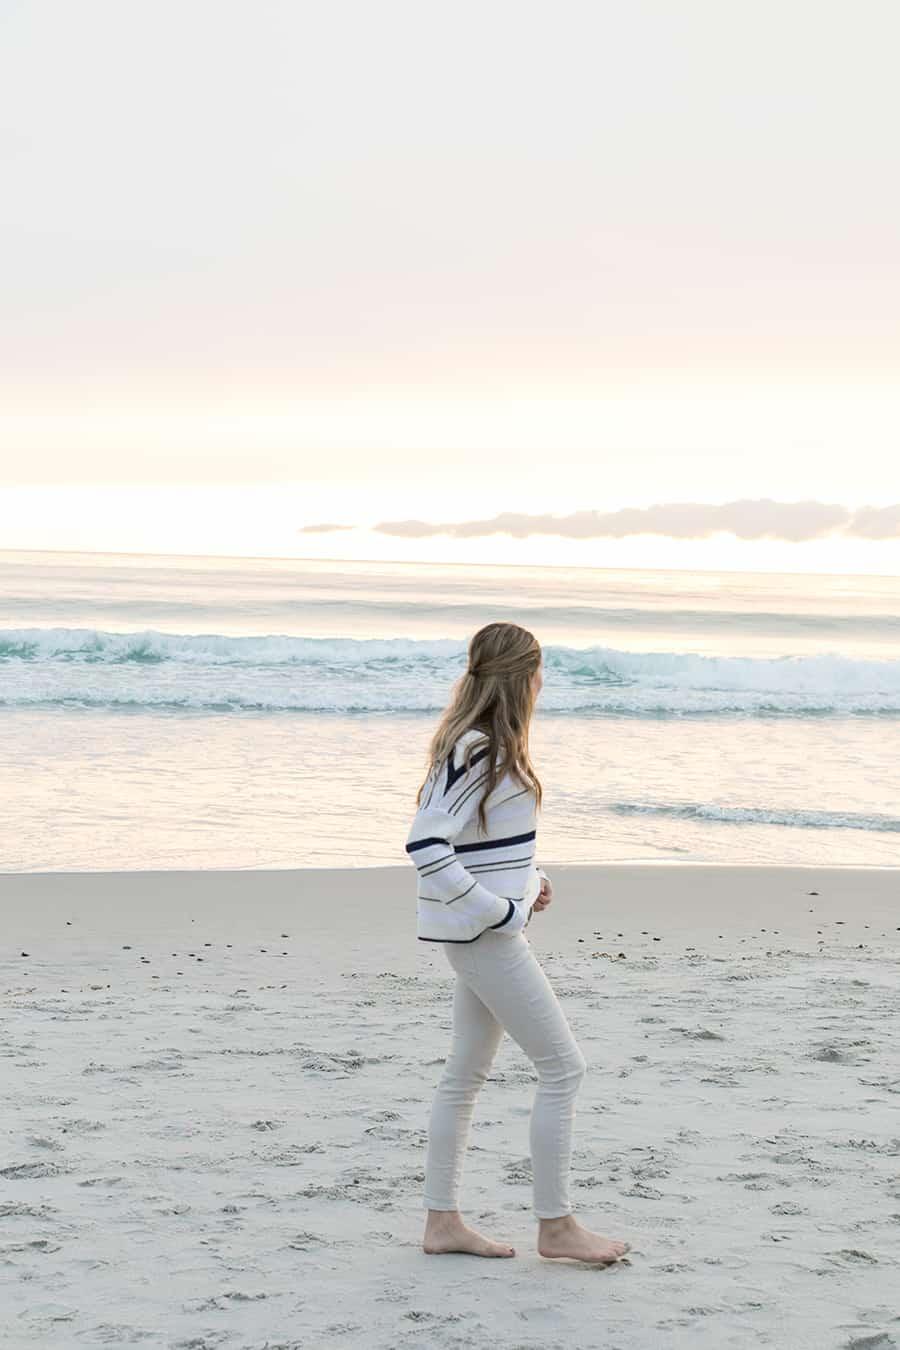 Eden Passante walking on the beach in Carmel